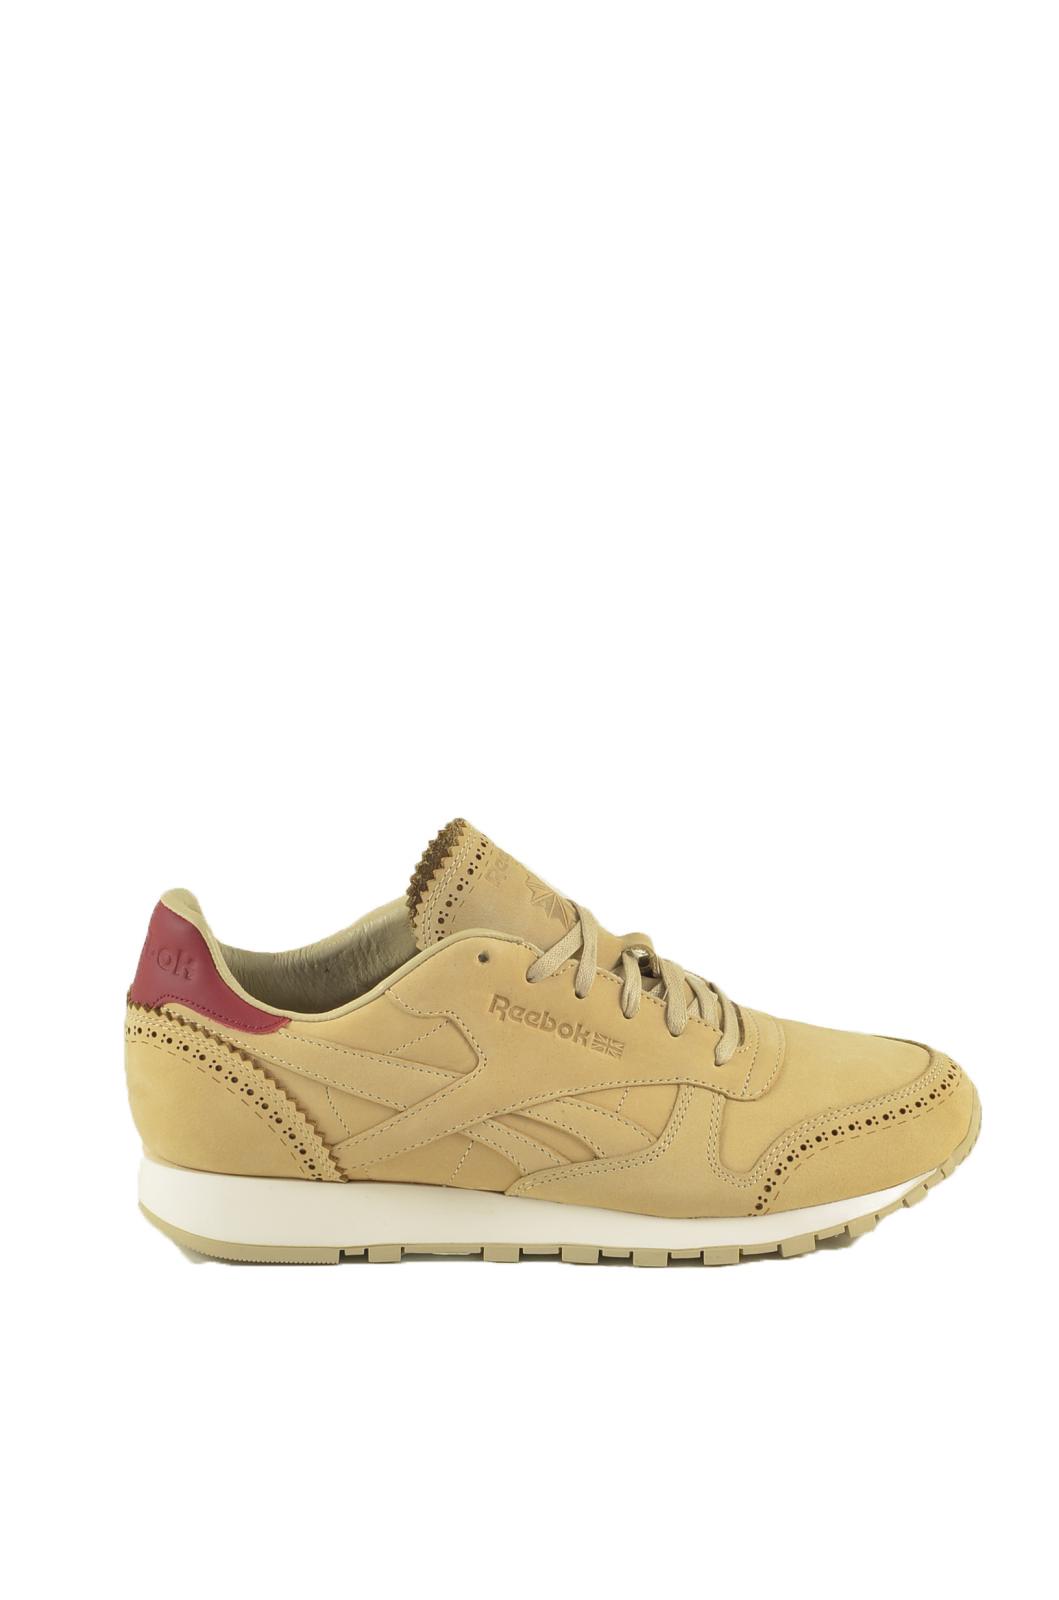 Reebok Sneakers Muži